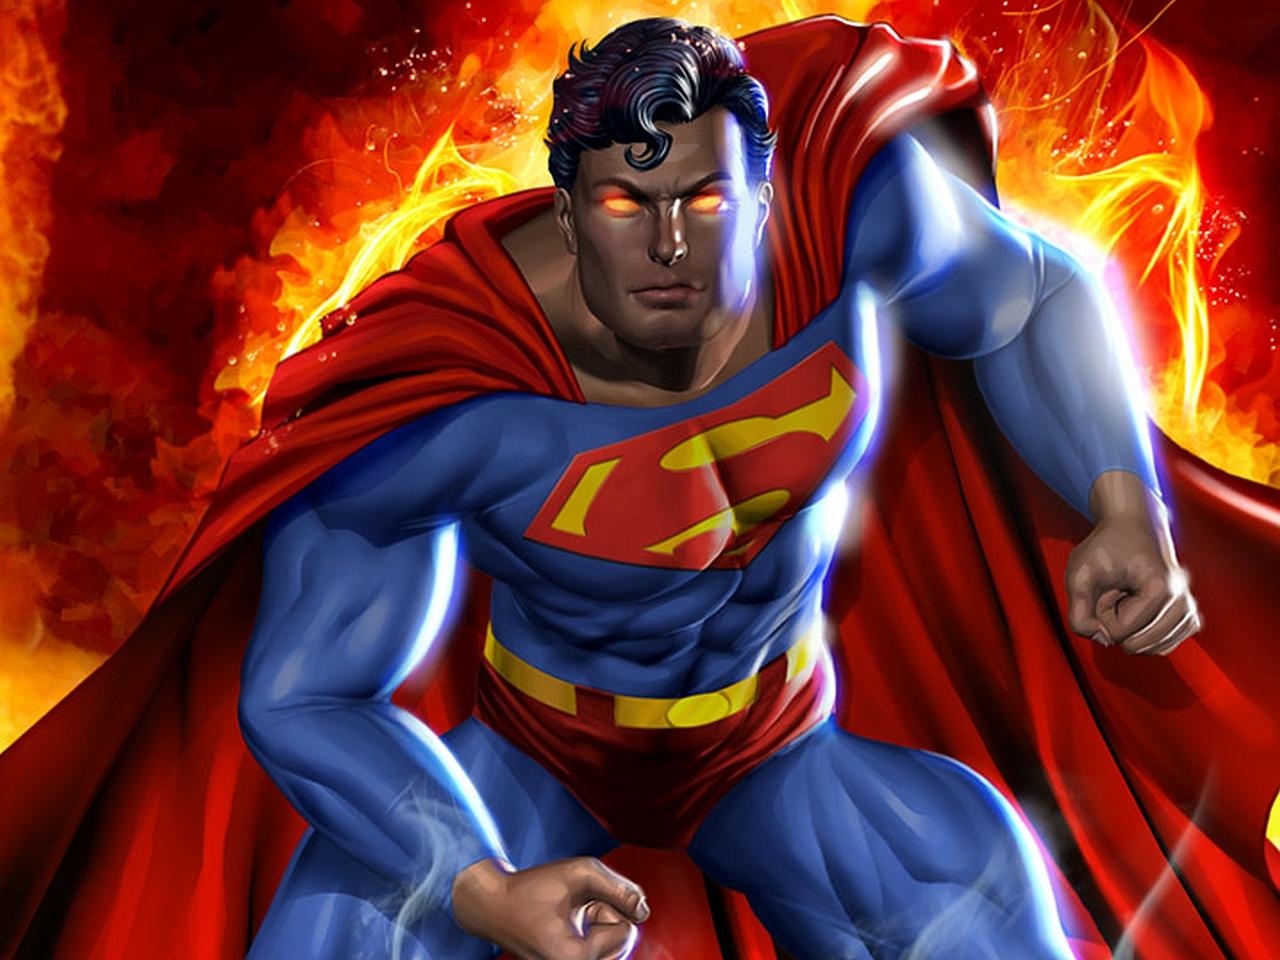 Wallpaper Abyss Explore the Collection Superman Comics Superman 353899 1280x960